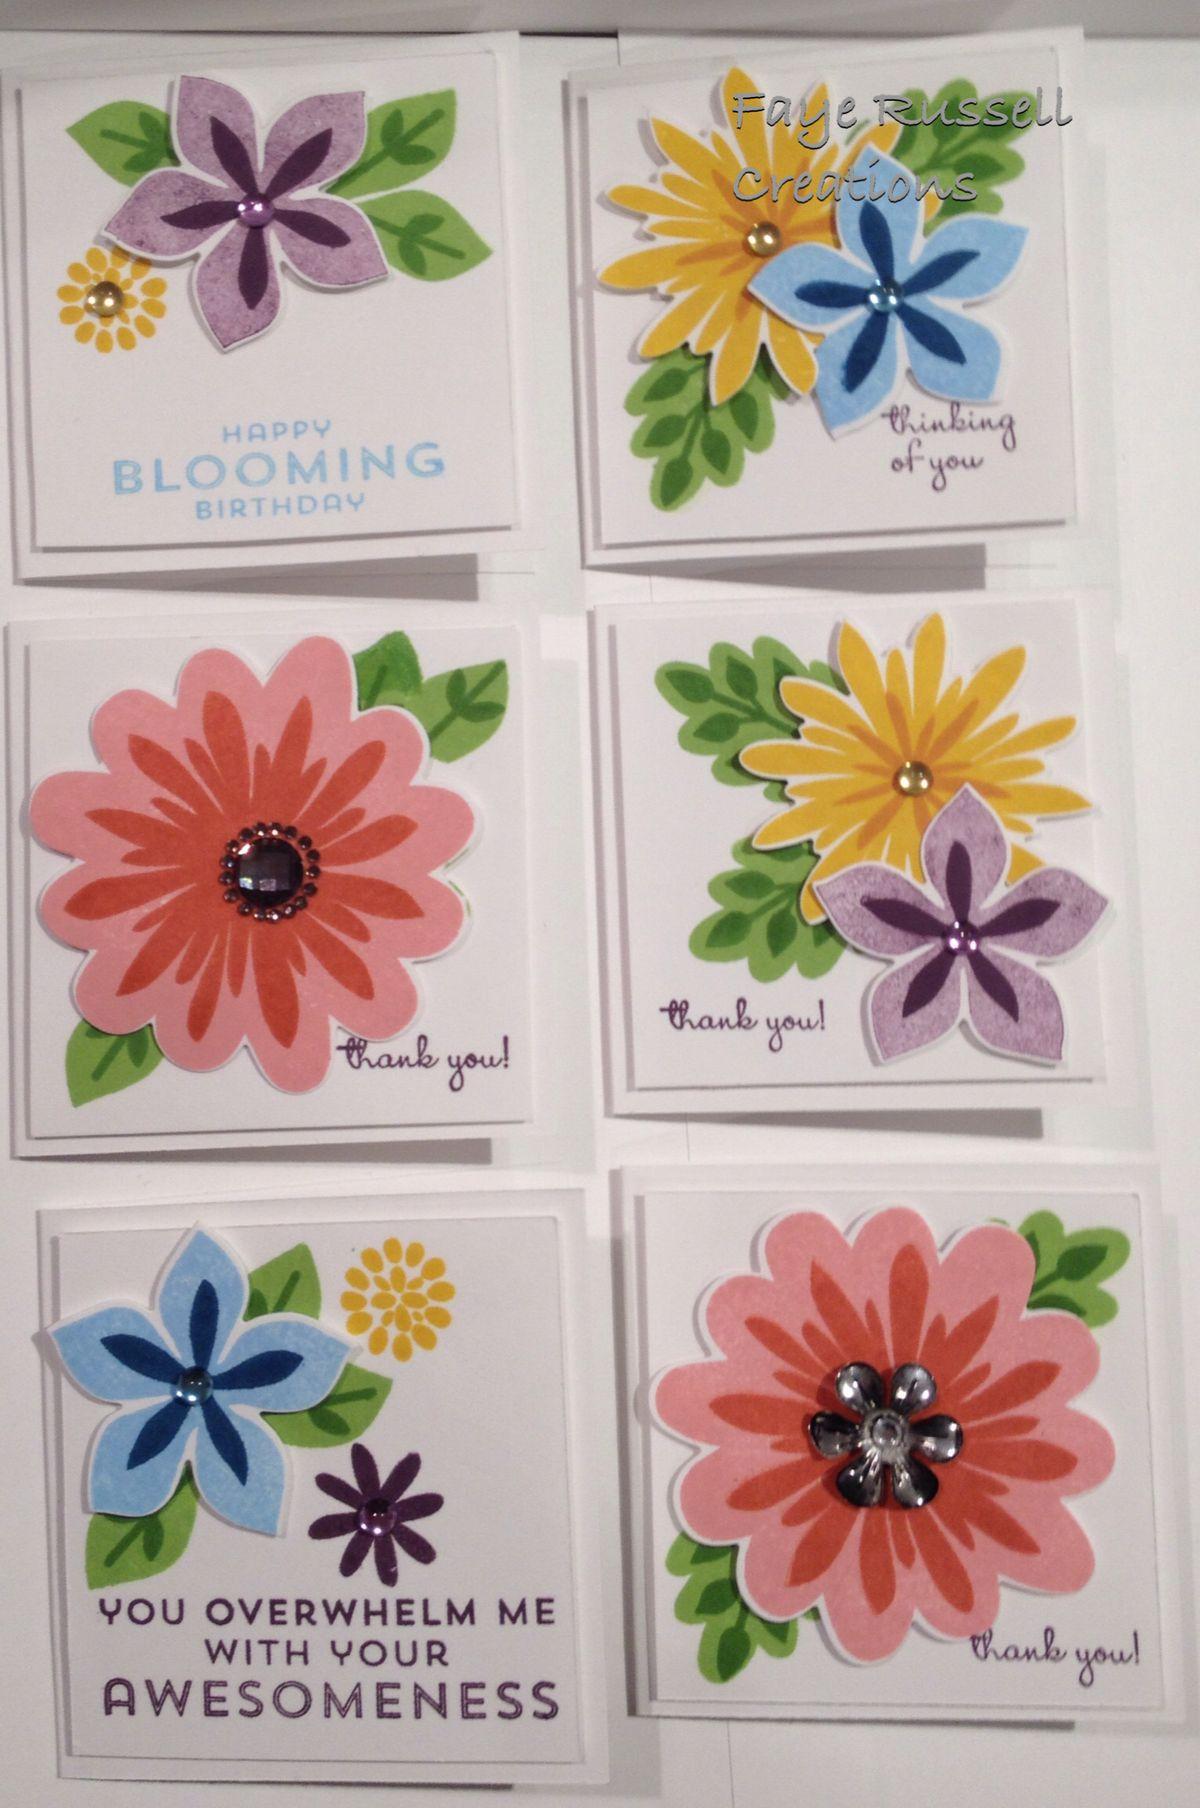 Flower Patch on Pinterest